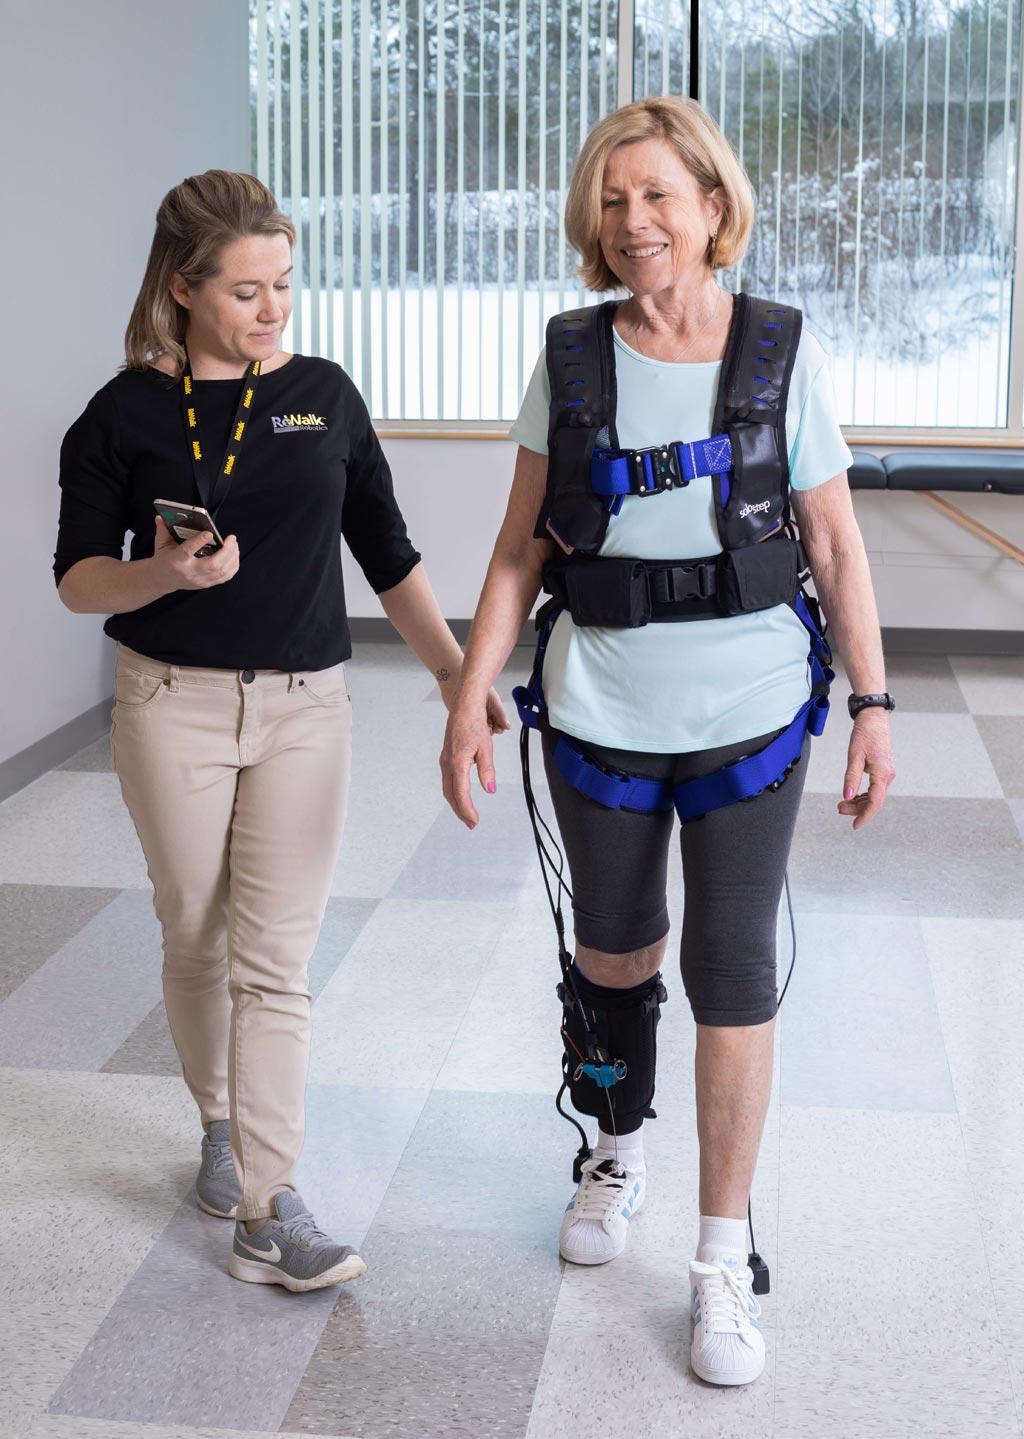 Image: A gait training device helps stroke survivor's rehabilitation (Photo courtesy of ReWalk).